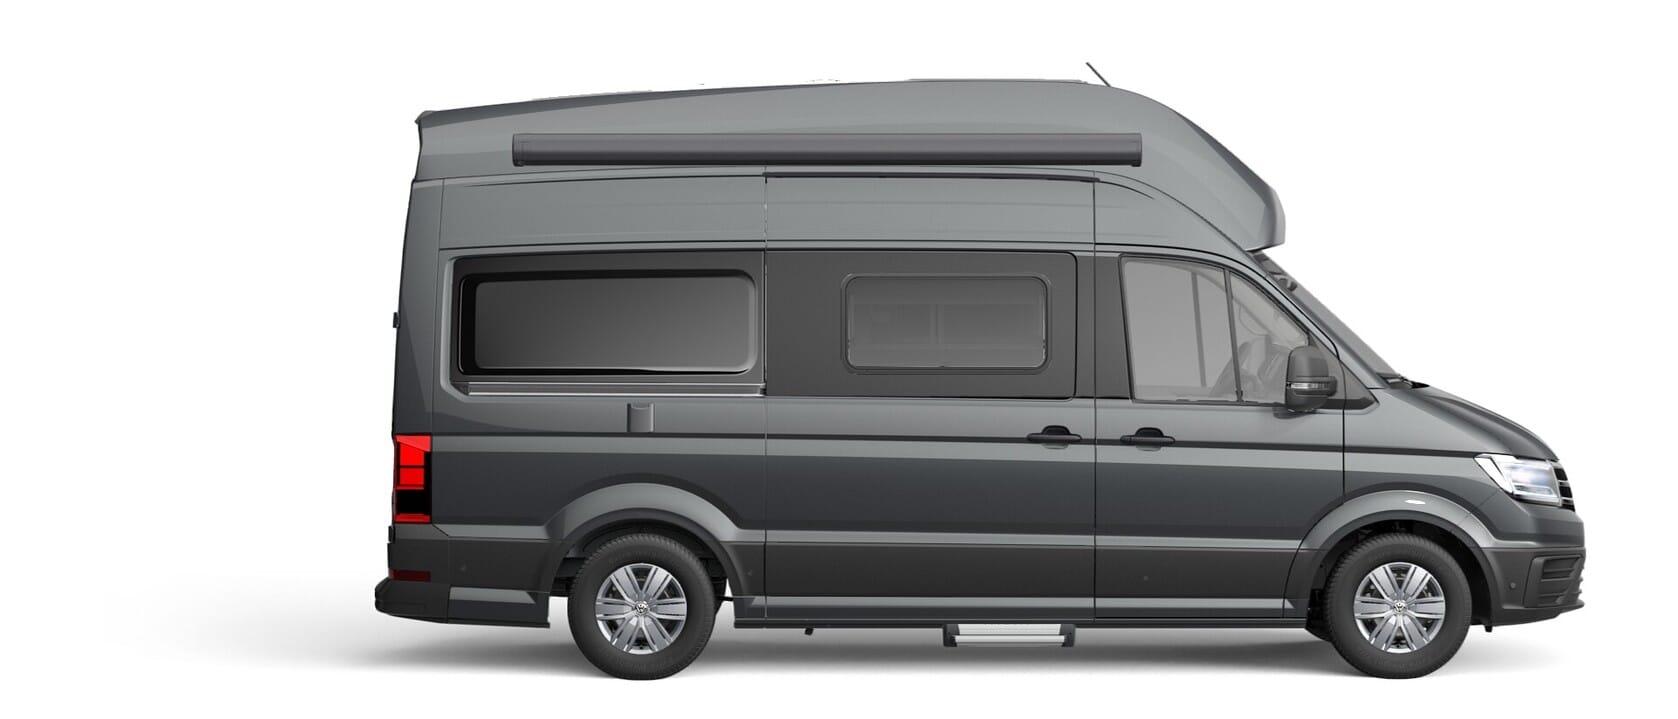 VW Grand California 600 2.0 TDI Frontantrieb 130 kW 8-Gang Automatik